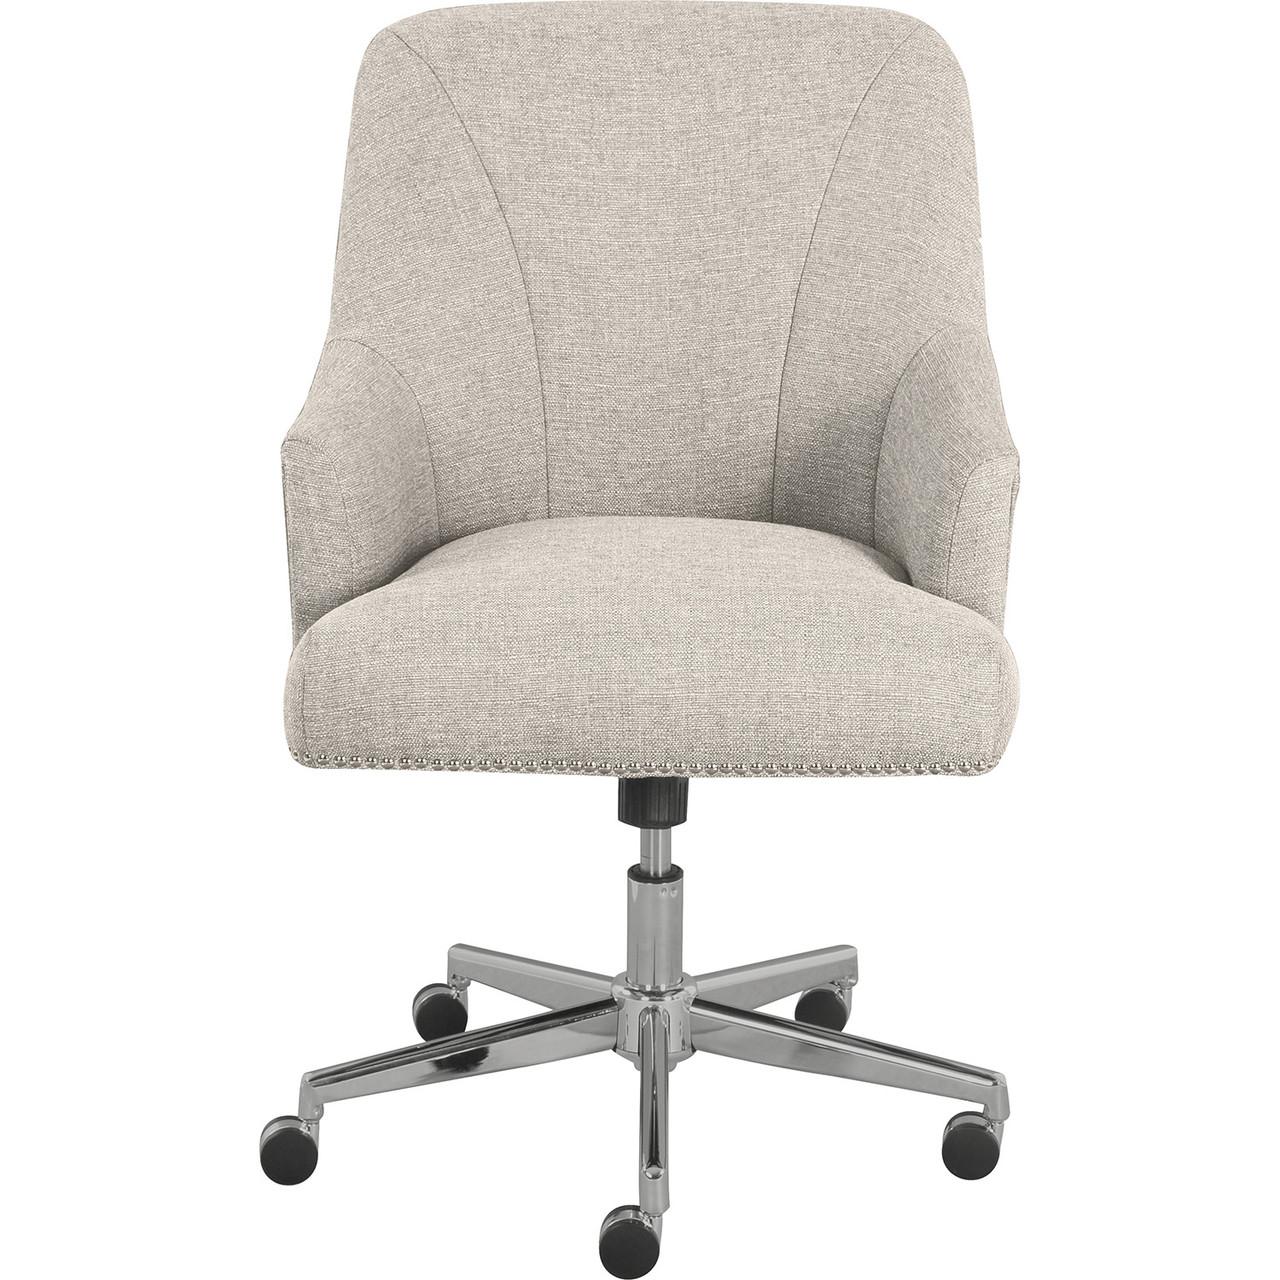 Serta Style Leighton Home Office Chair Light Gray Clickdecor